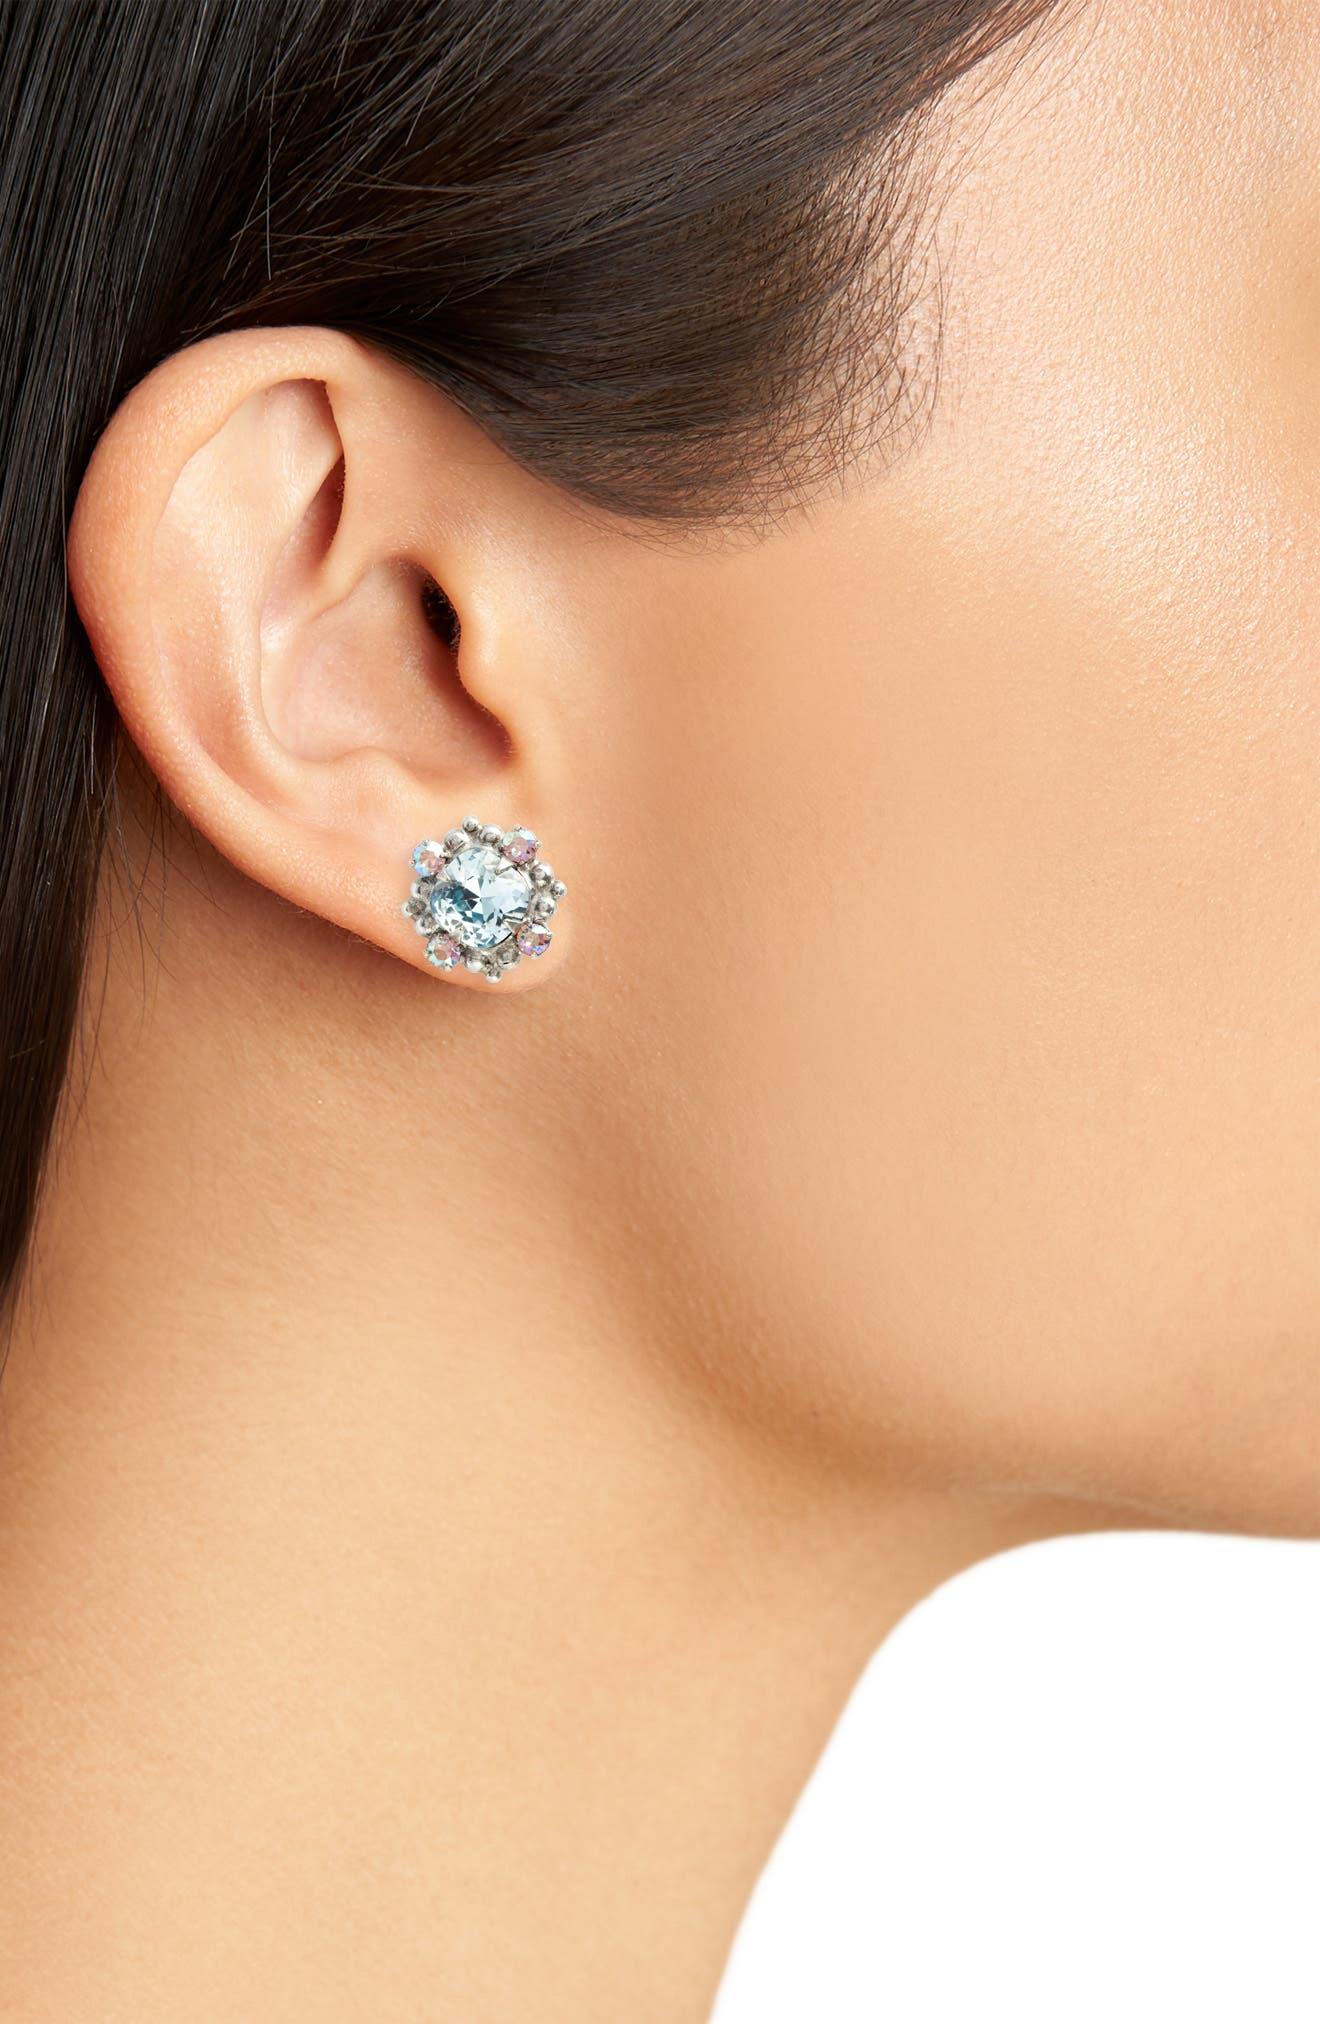 Hibiscus Crystal Earrings,                             Alternate thumbnail 2, color,                             BLUE